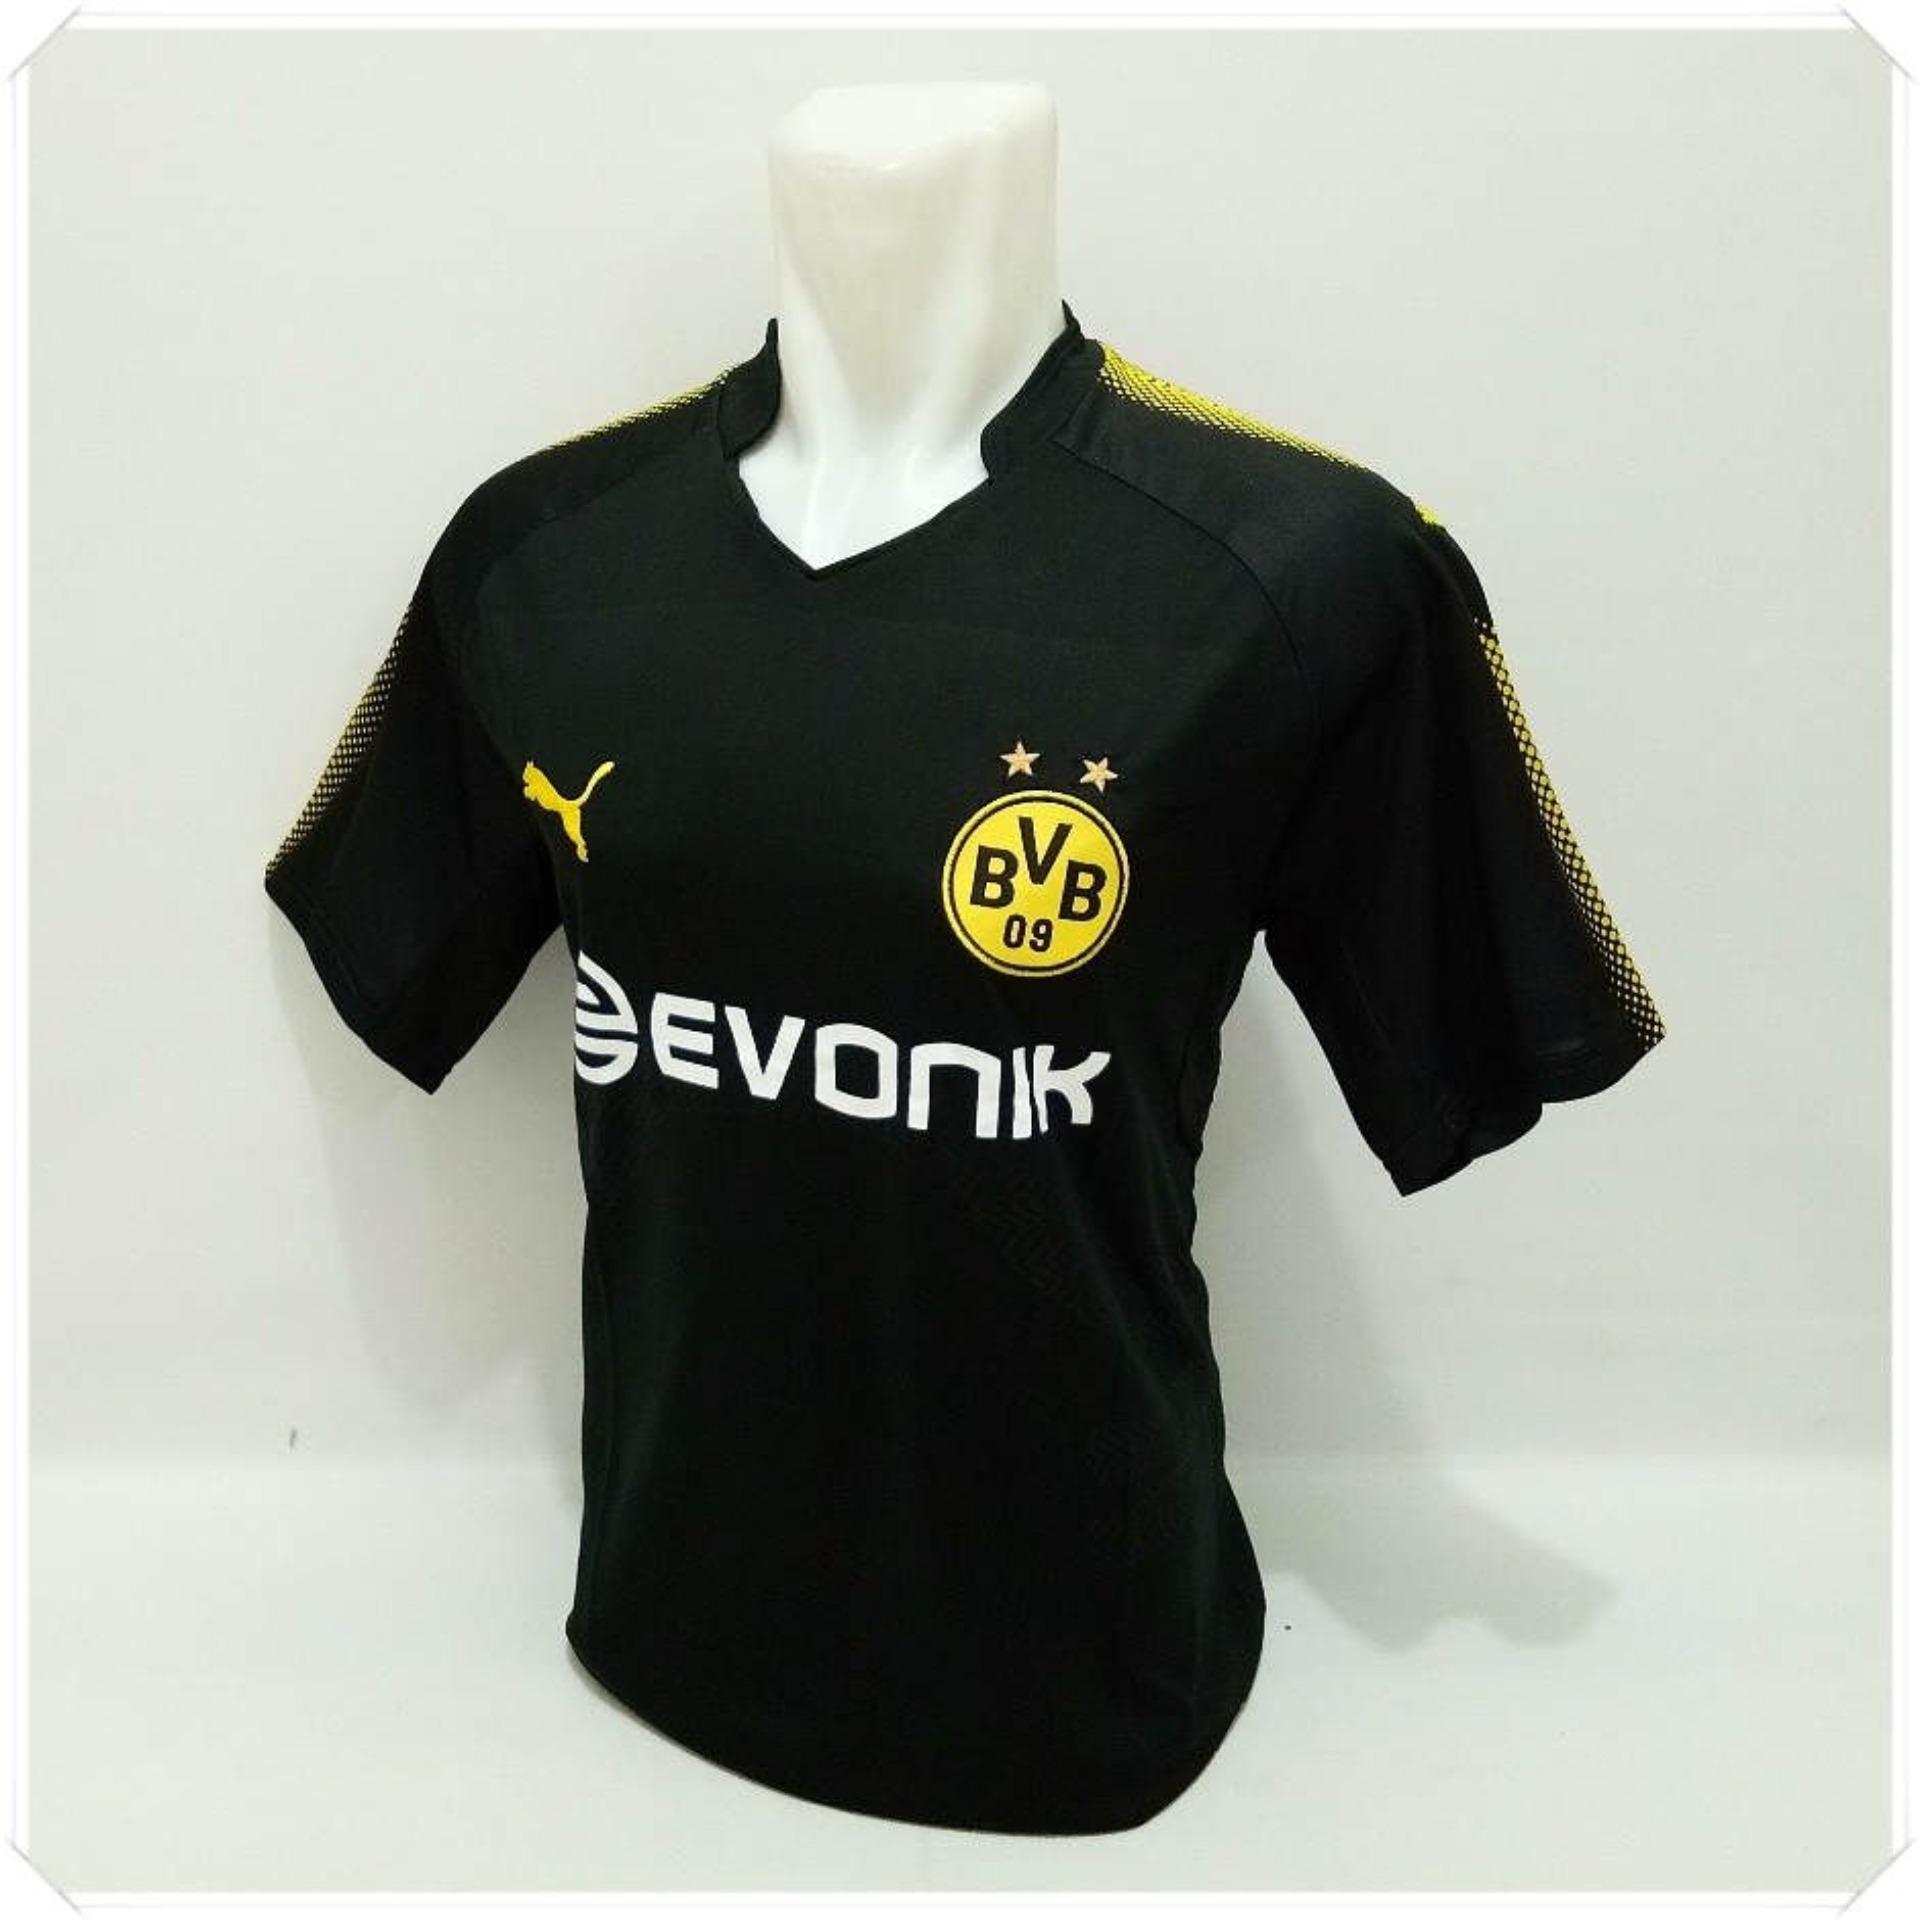 Spesifikasi T Shirt Kaos Olahraga Bola Baju Bola Pakaian Pria Sport Atasan Pria Football Futsal Jersey Bola Murah Dortmund Away Online